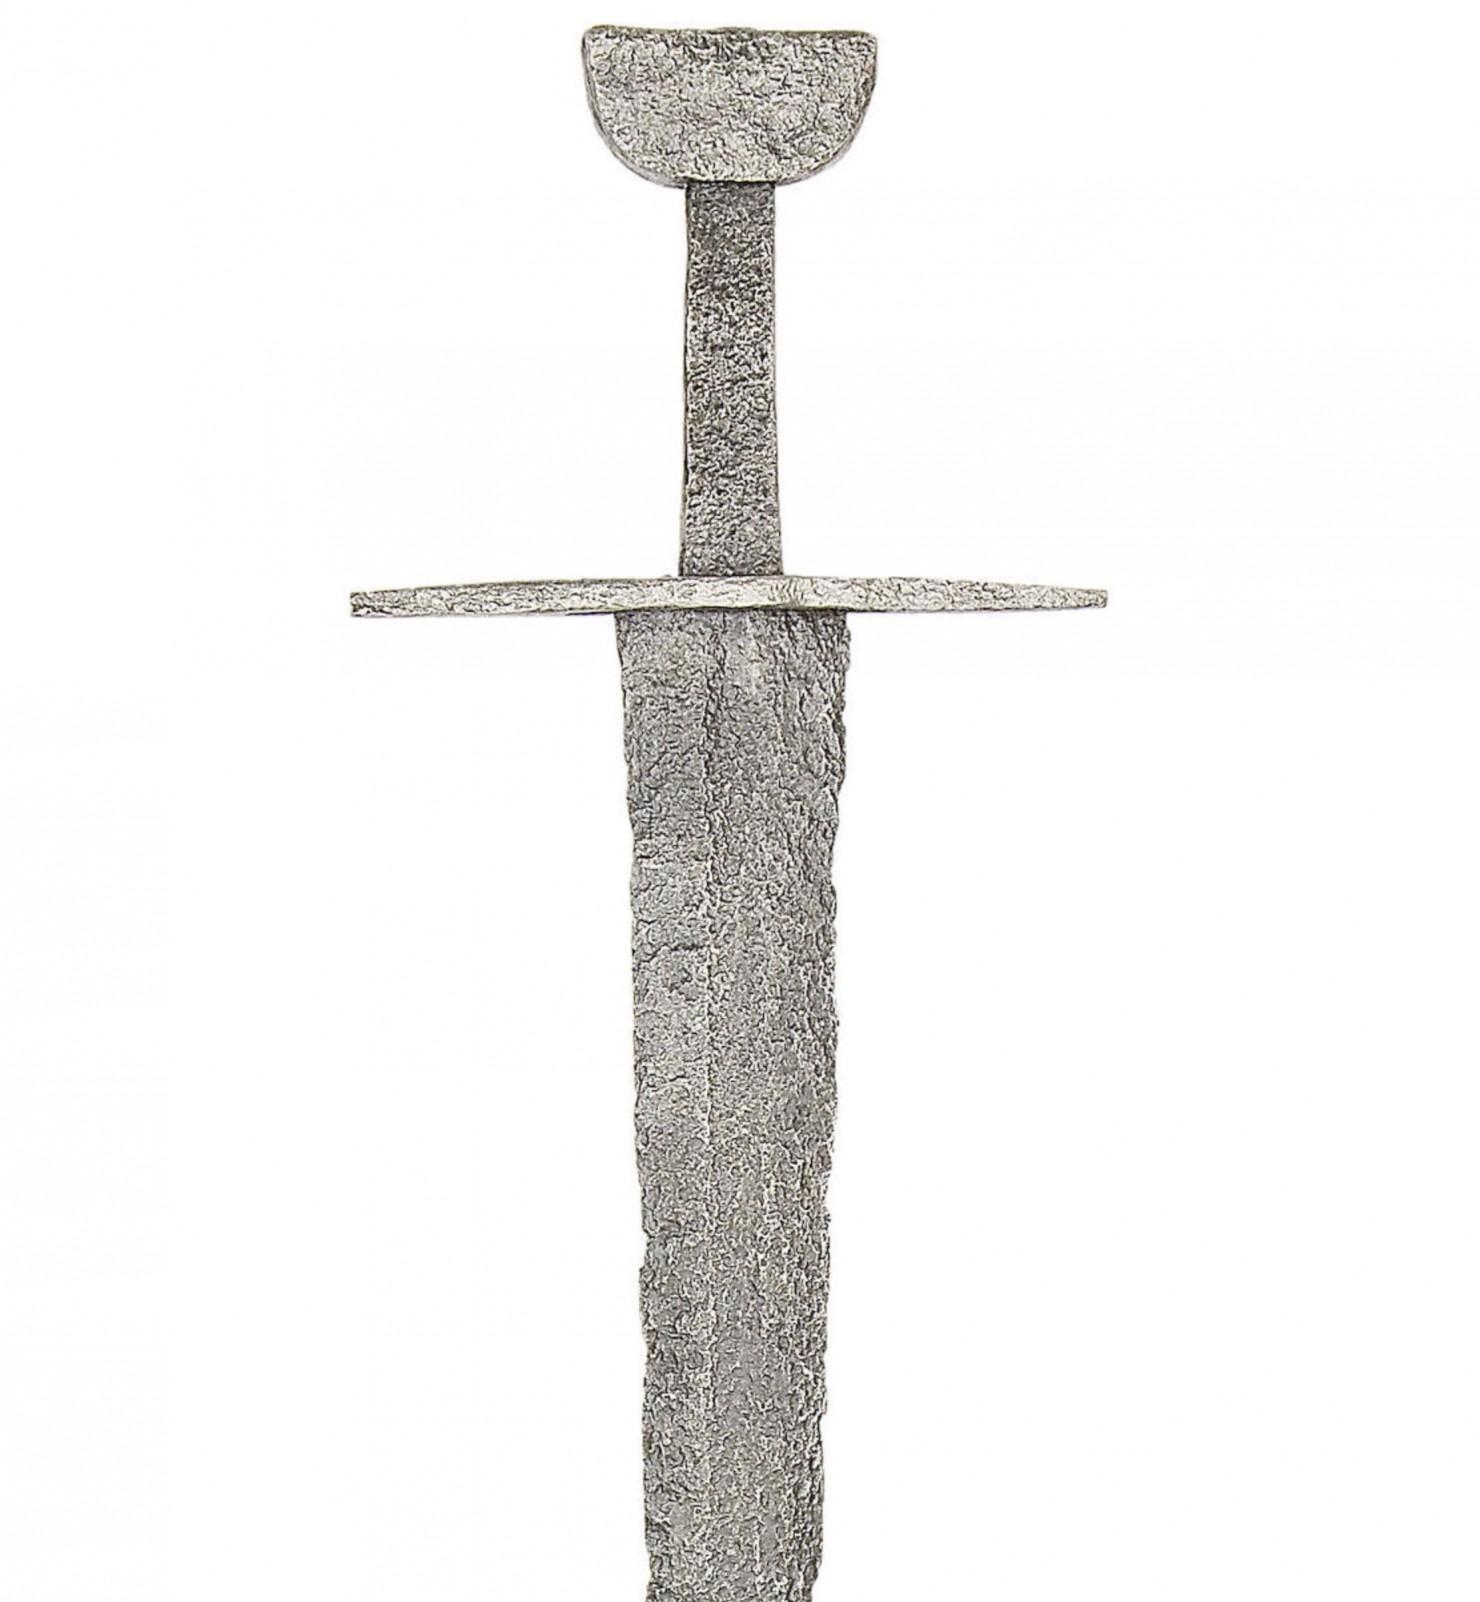 Medieval Viking Swords